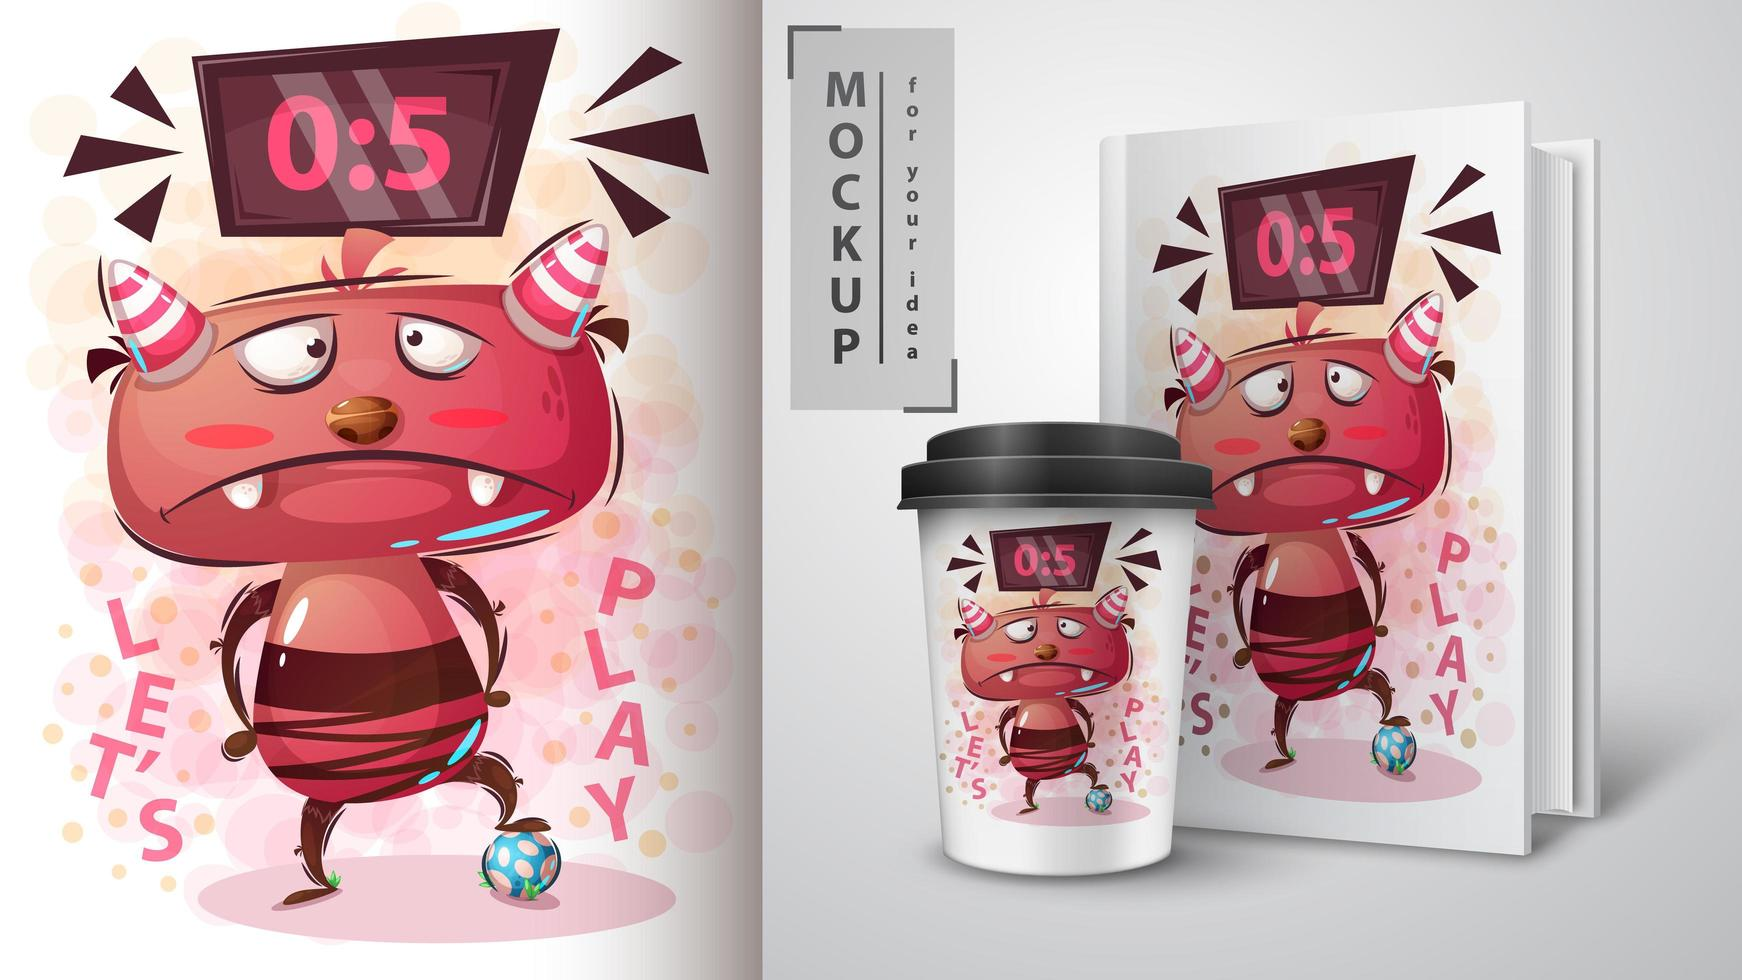 Cartoon Monster Playing Soccer Design vector